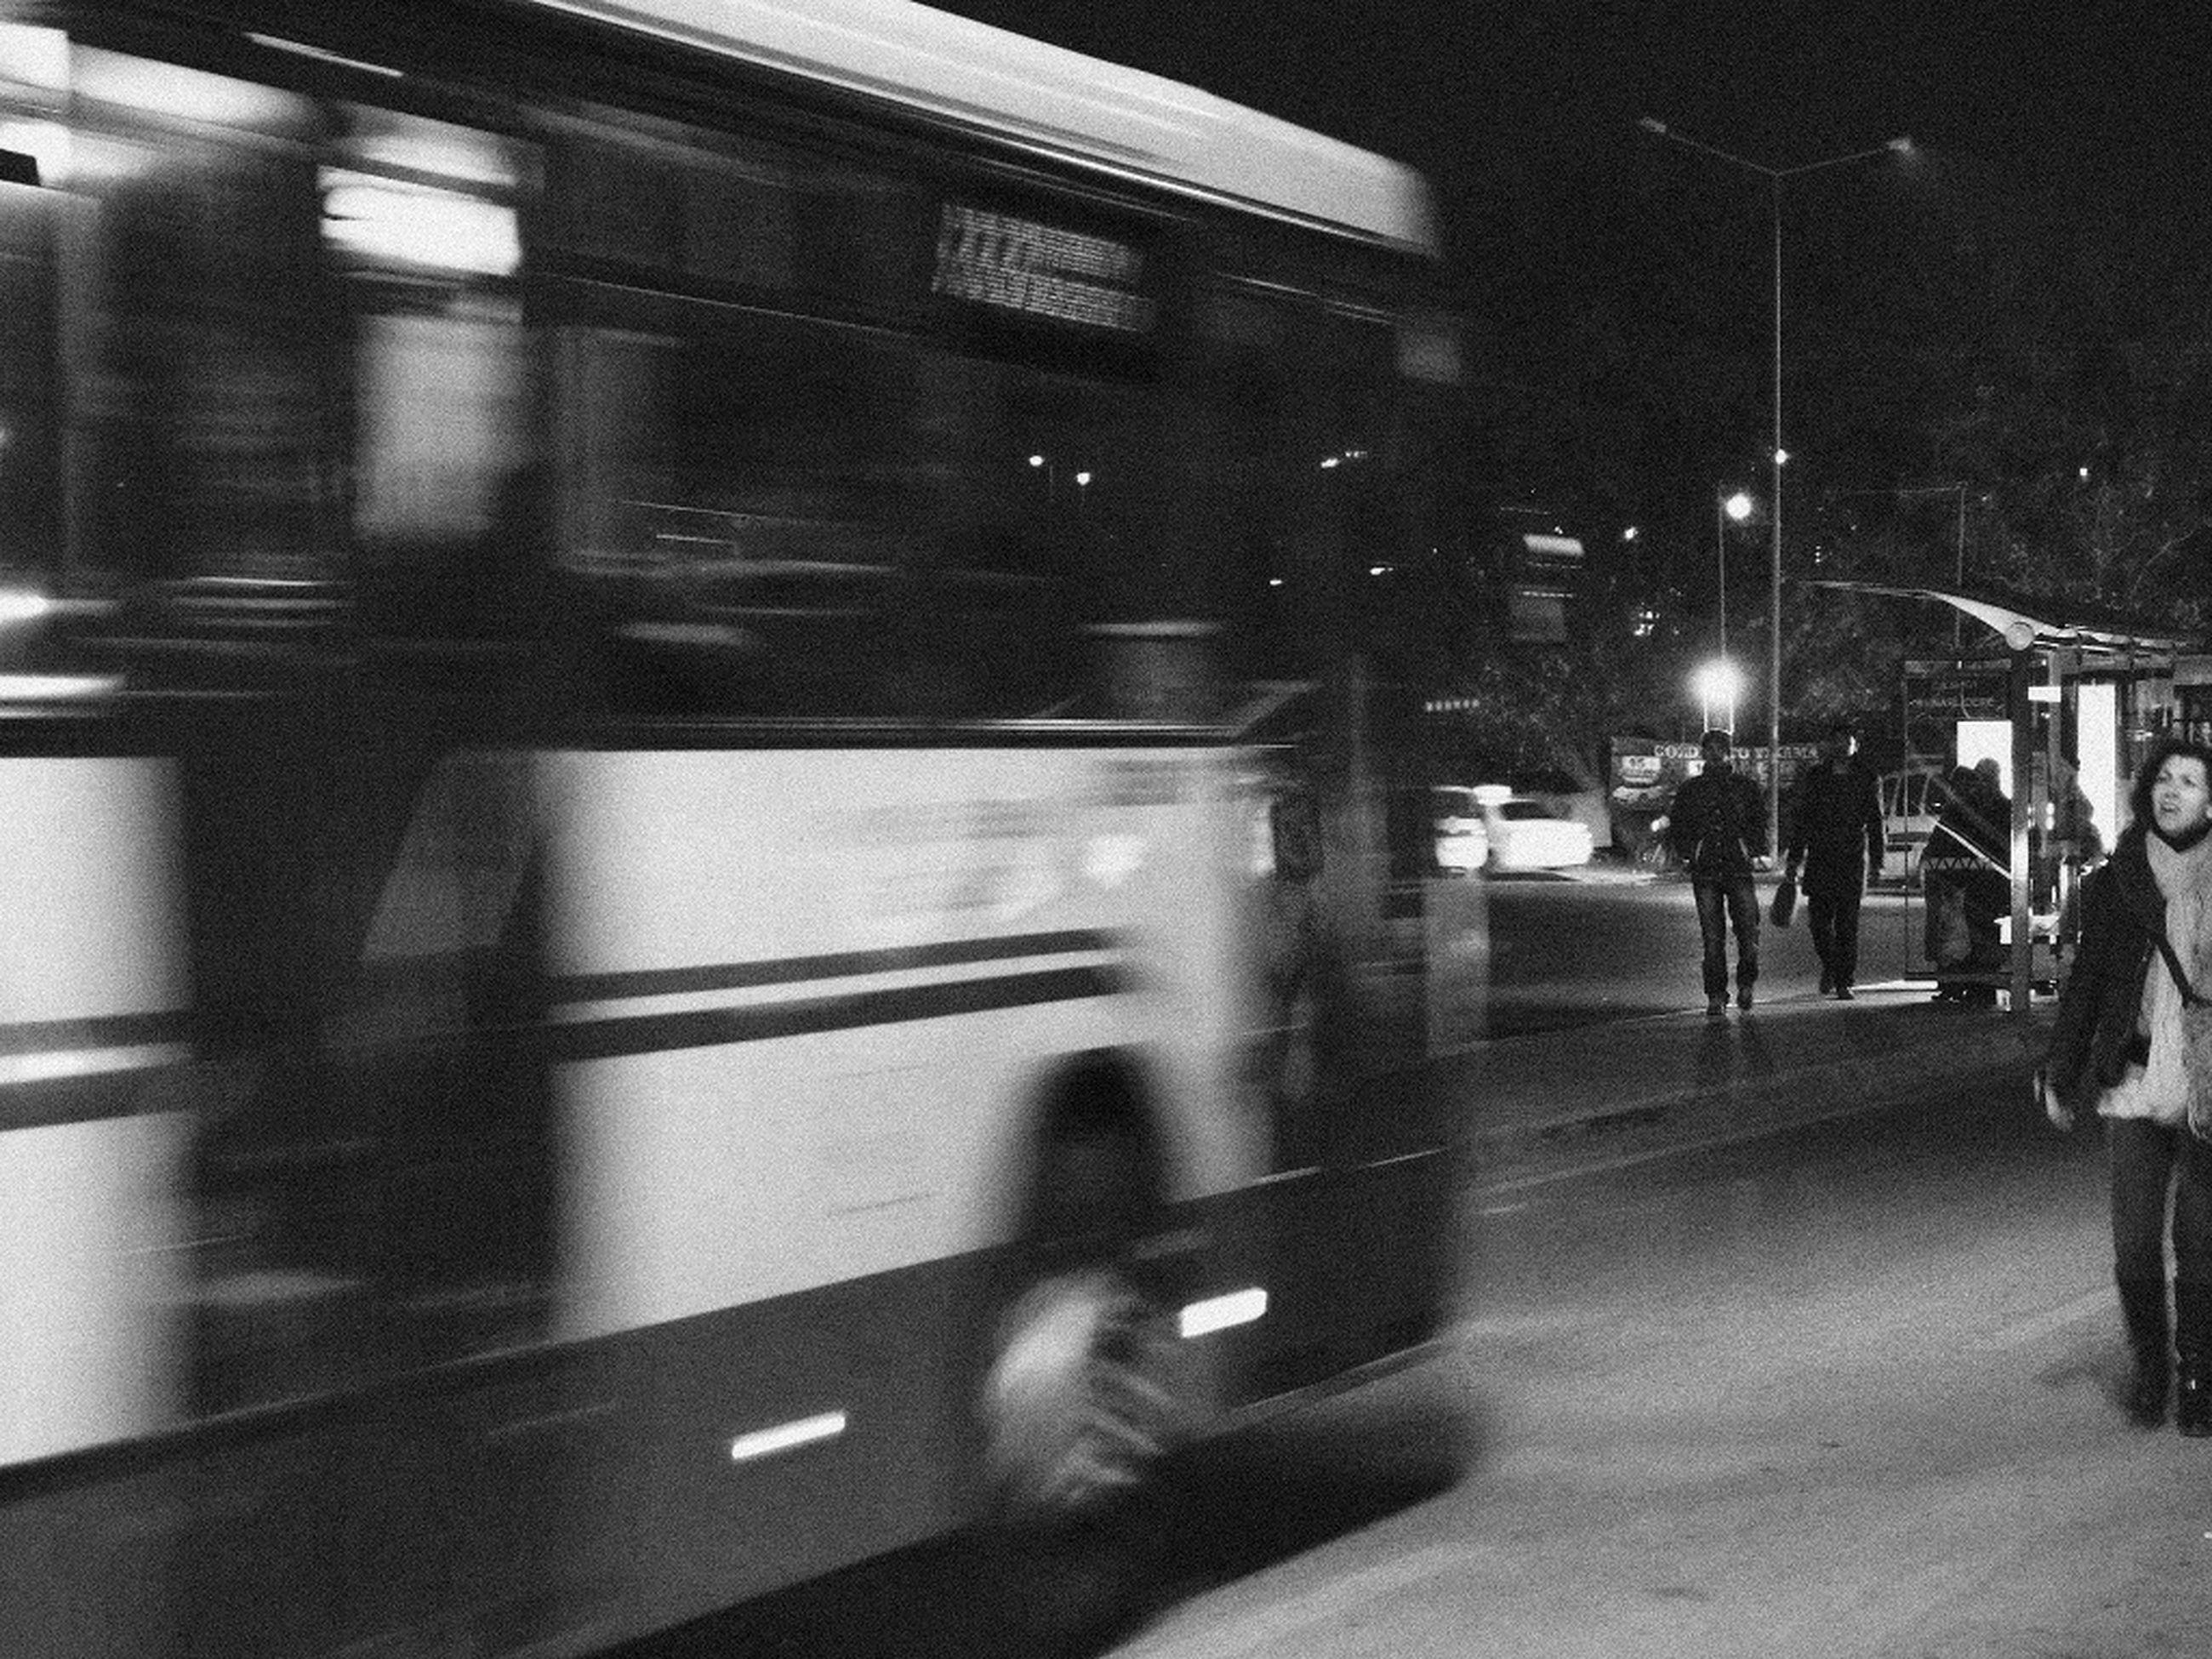 transportation, mode of transport, land vehicle, car, on the move, travel, public transportation, illuminated, street, blurred motion, road, night, men, city life, motion, railroad station platform, train - vehicle, city